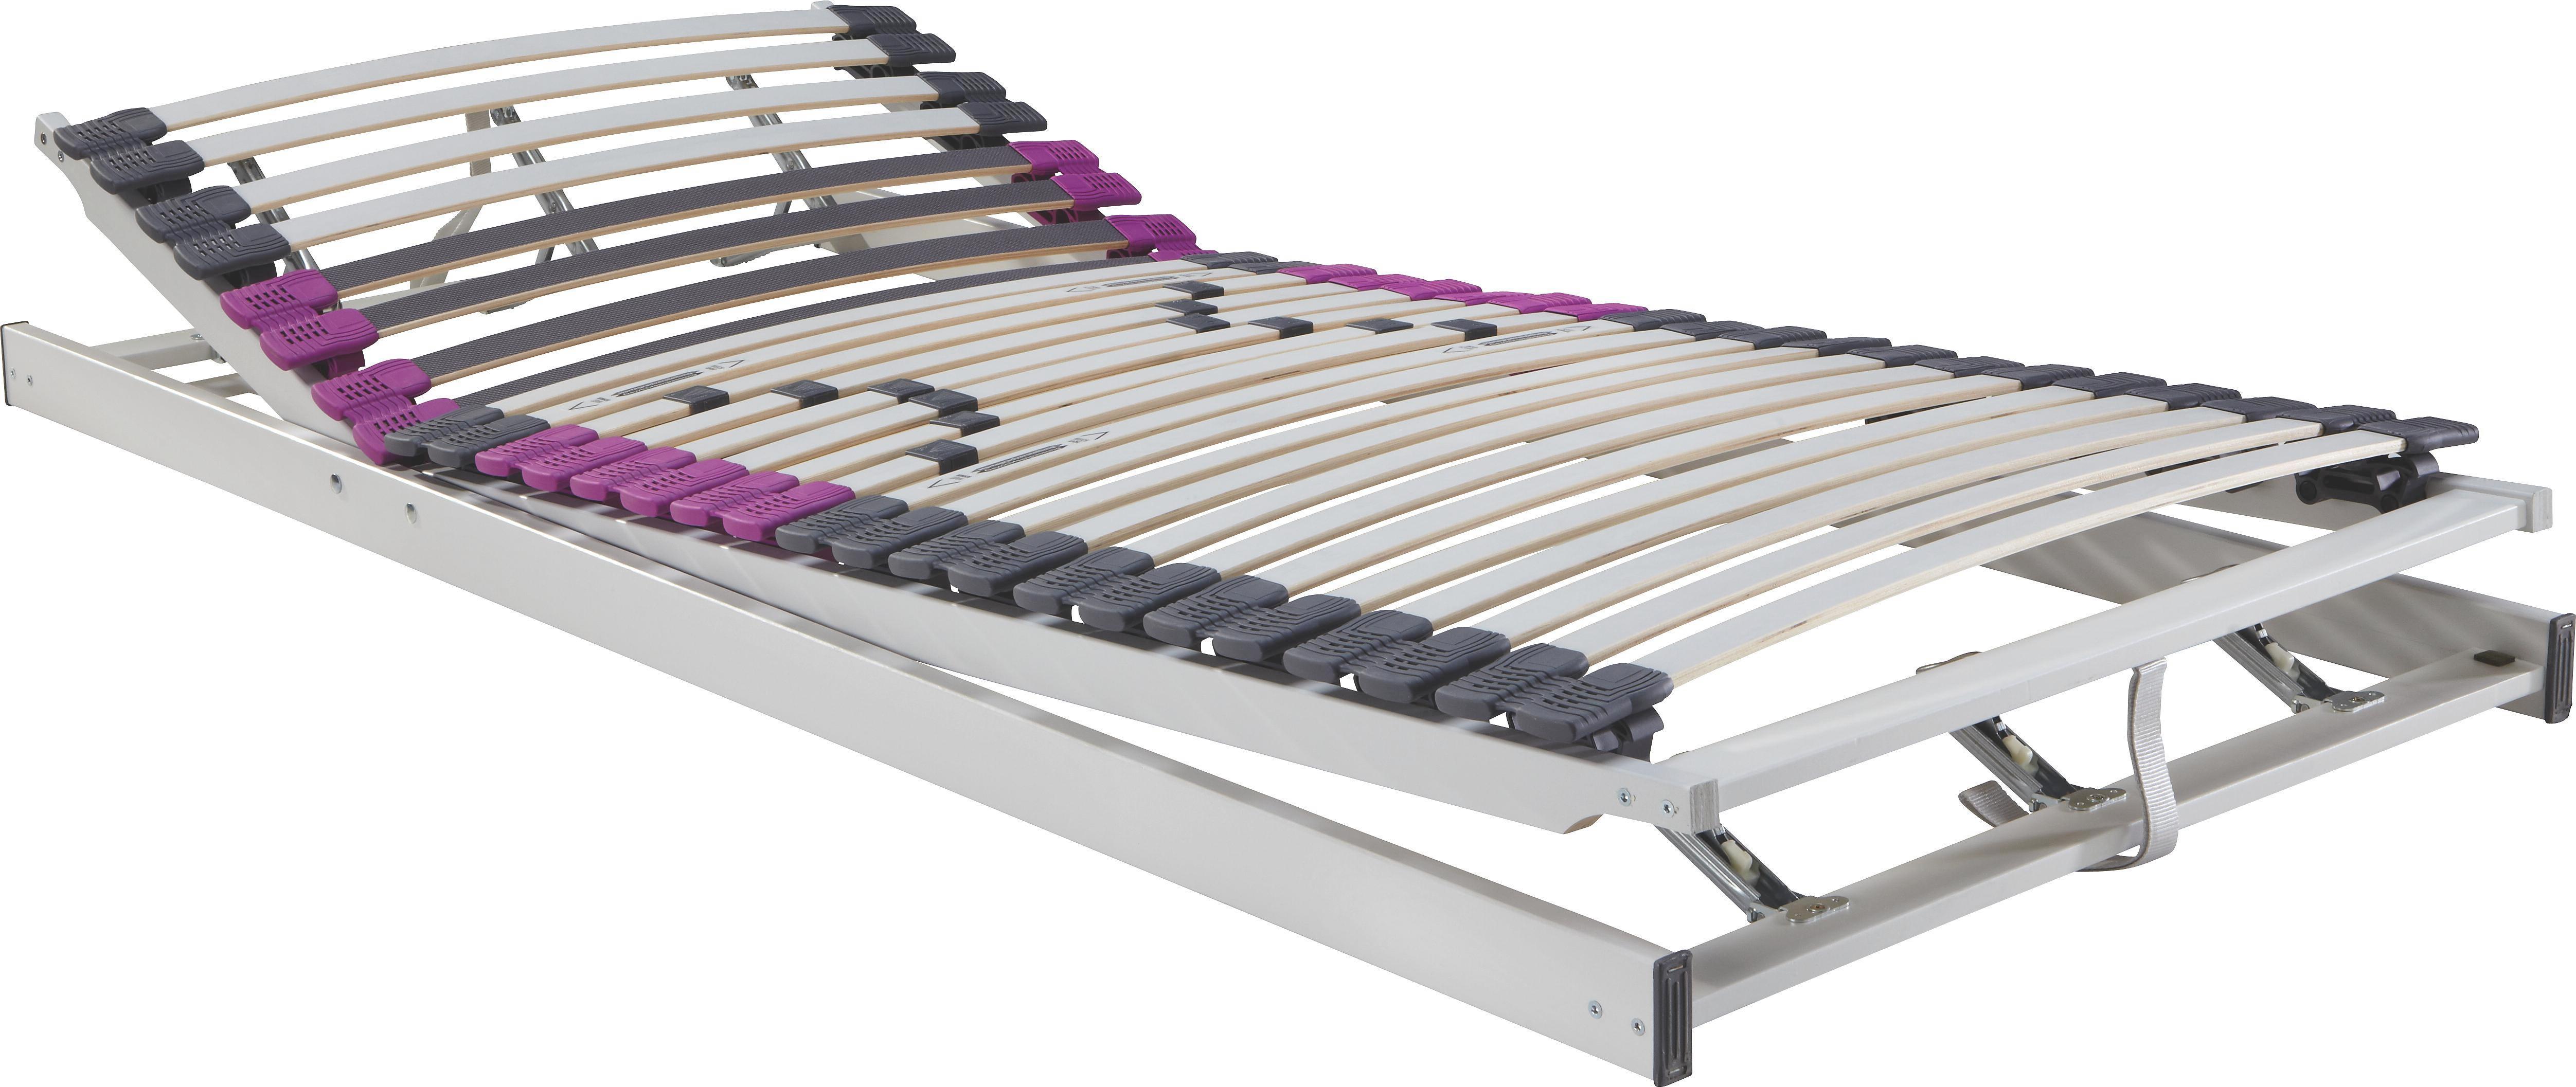 Lattenrost verstellbar, ca. 100x200cm - (100/200cm) - NADANA